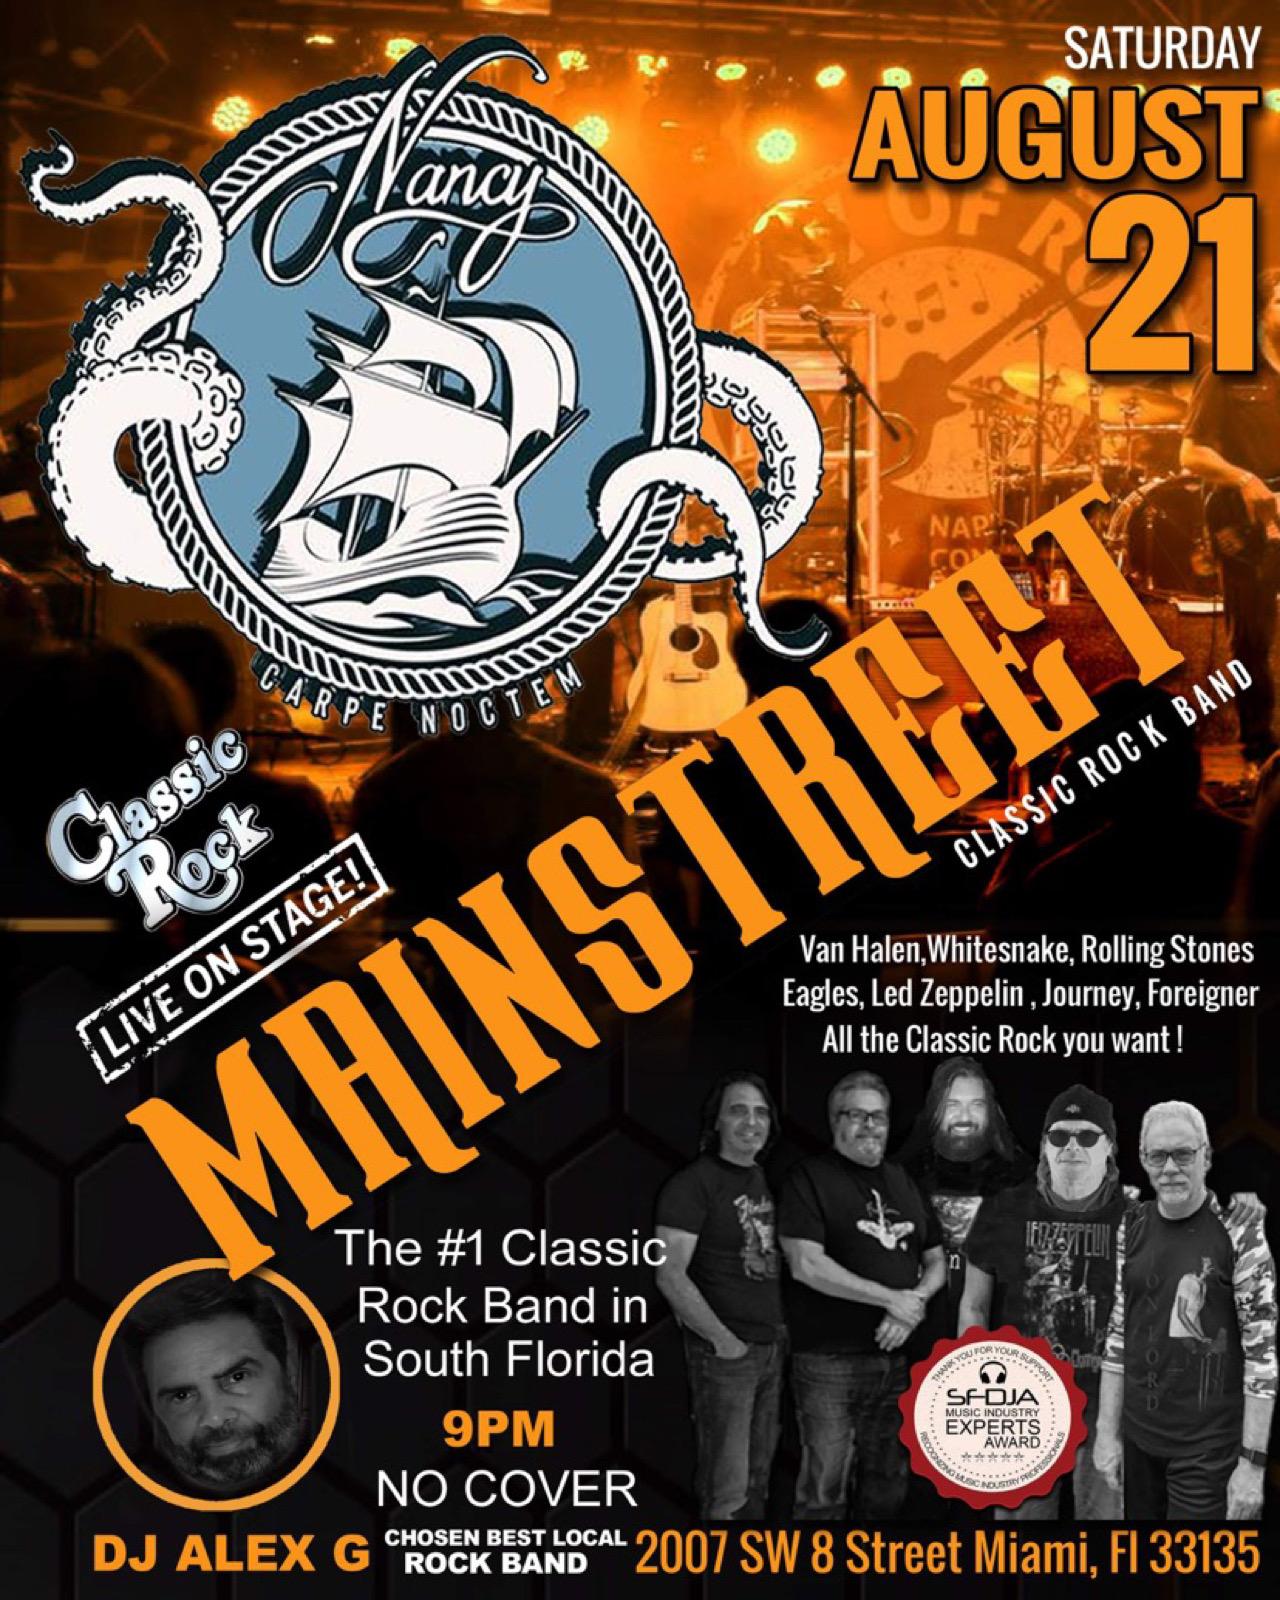 MAINSTREET at Bar Nancy August 21 - 9PM